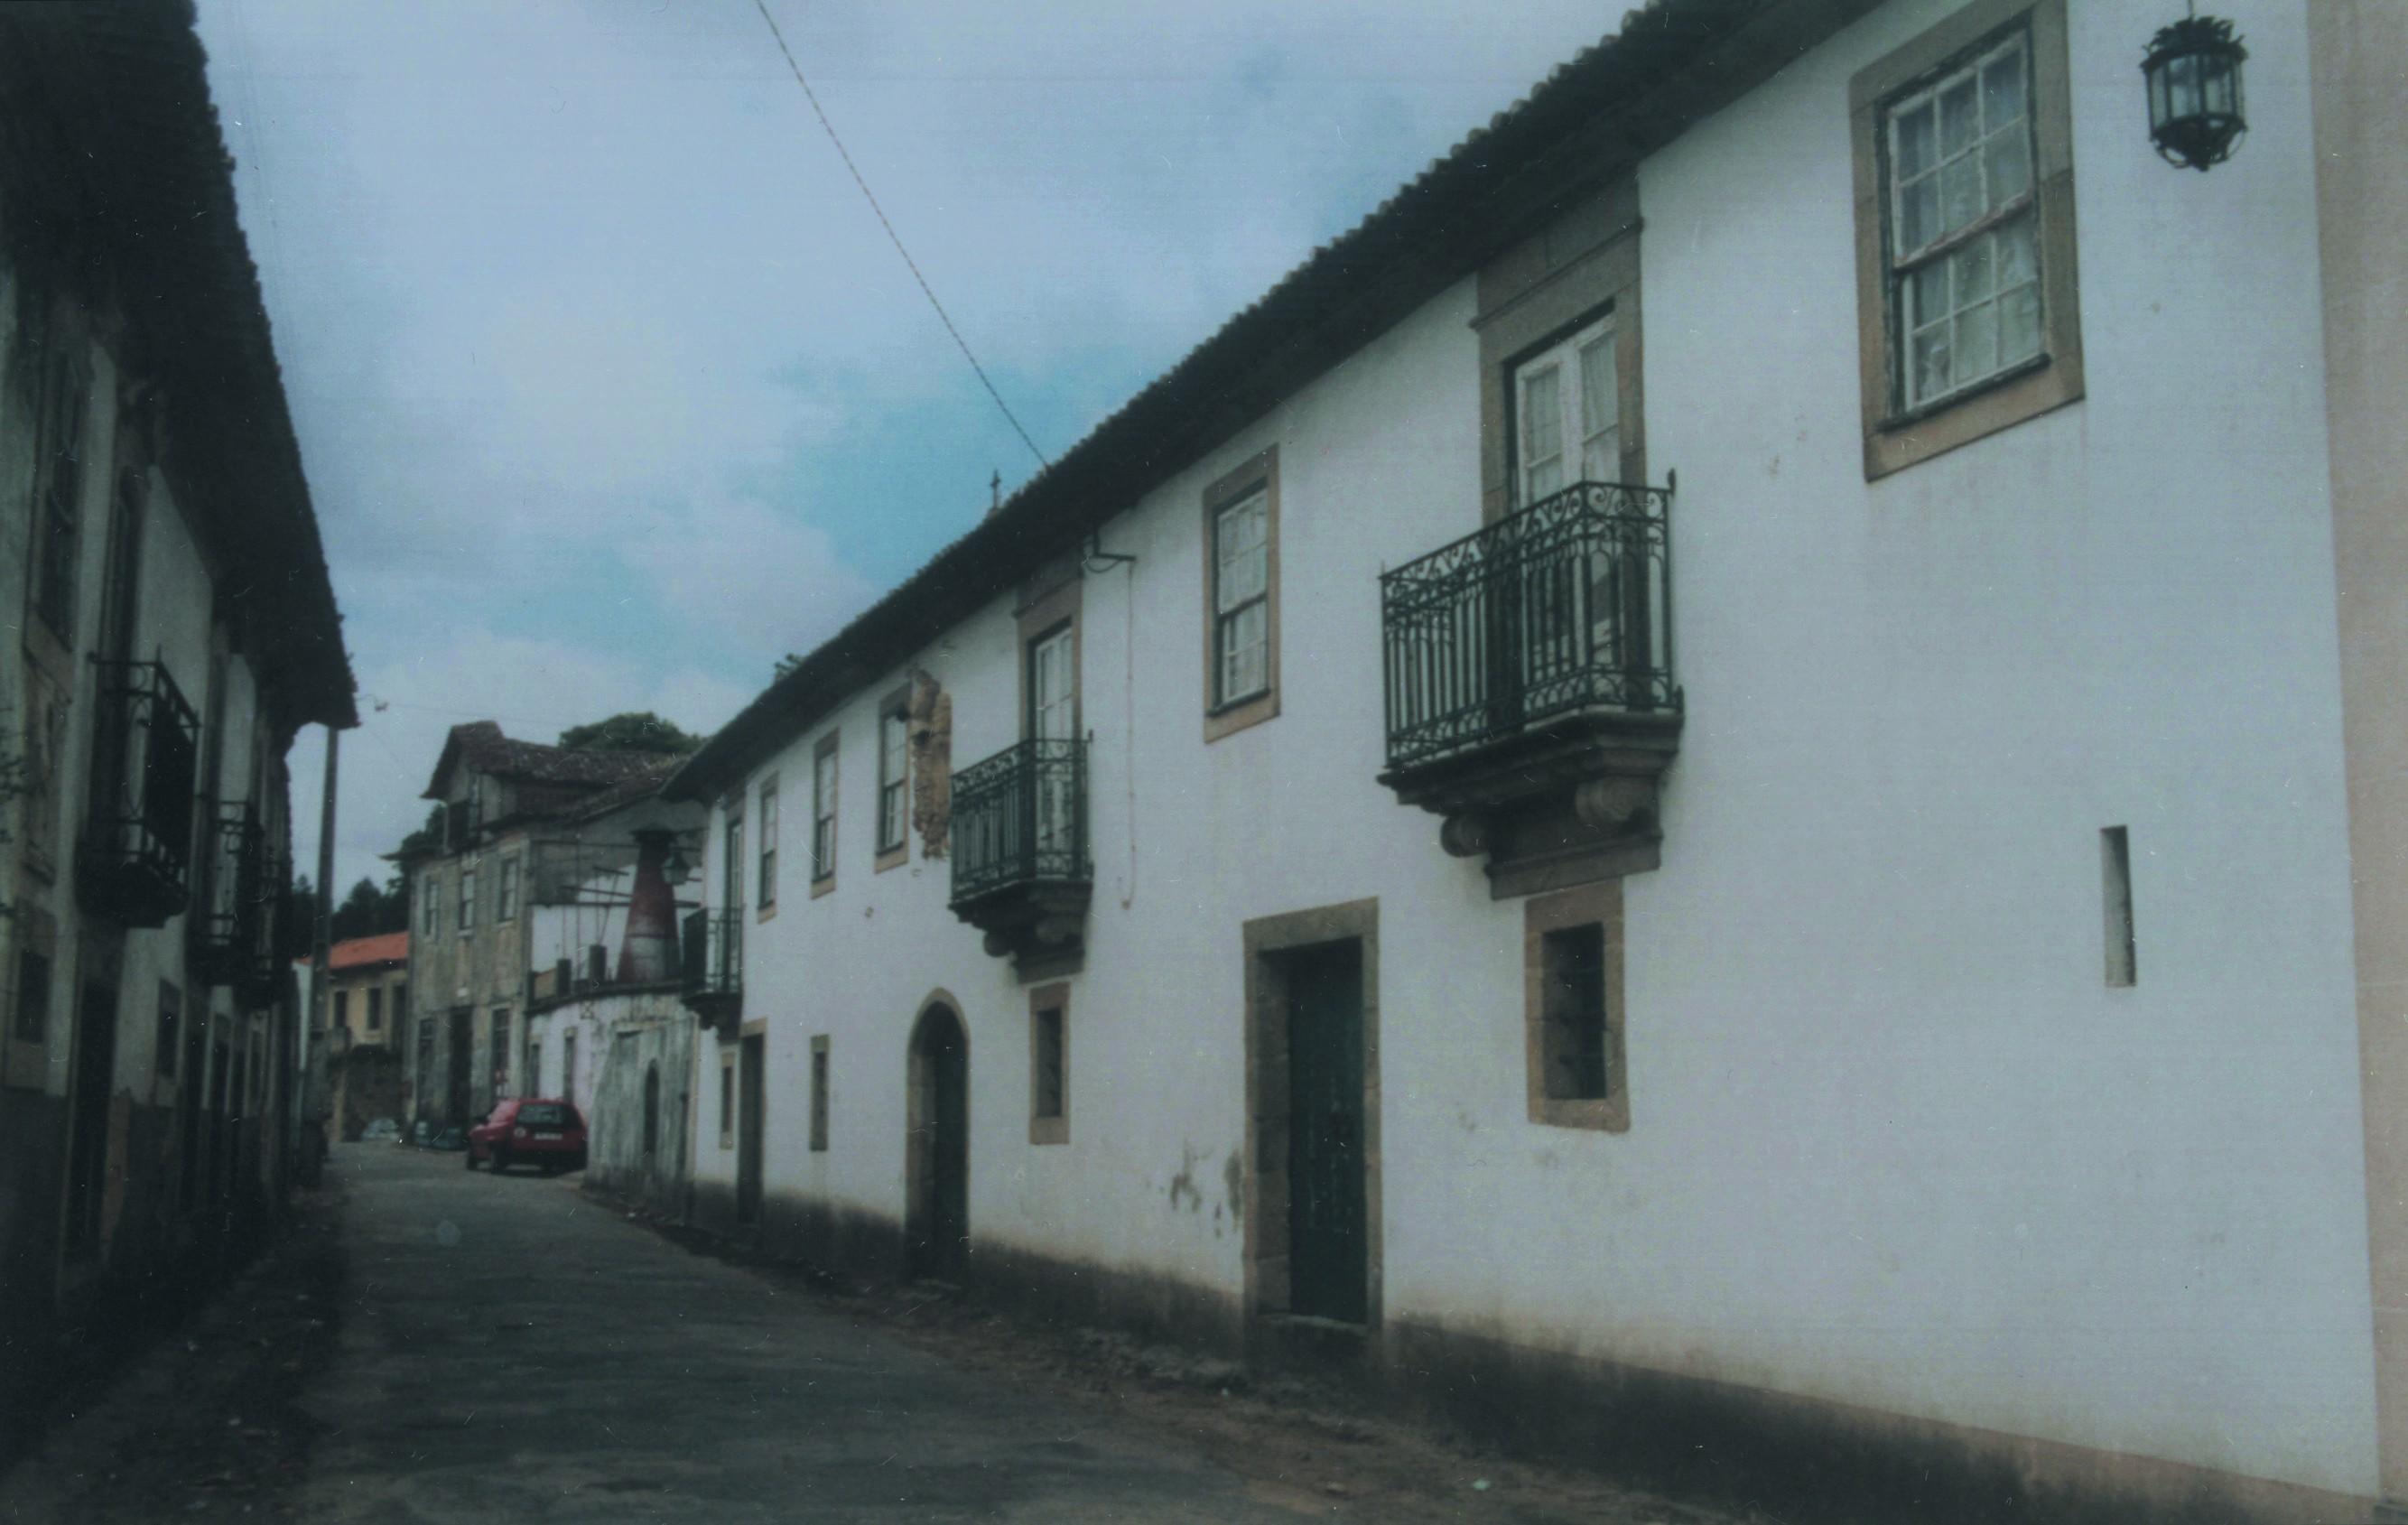 Casa dos Cortes Reais, Pinheiro da Bemposta (1998)